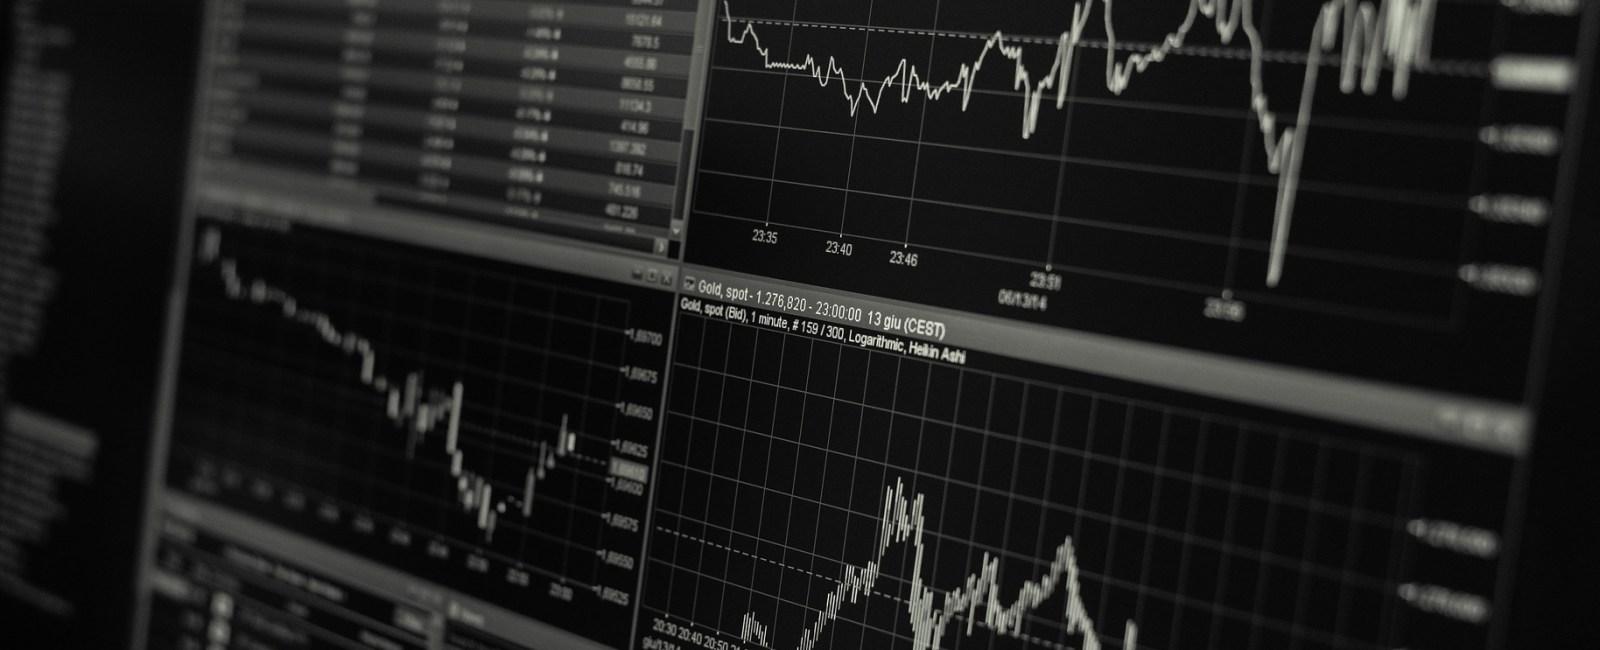 NICE Actimize finance trading bank stock market